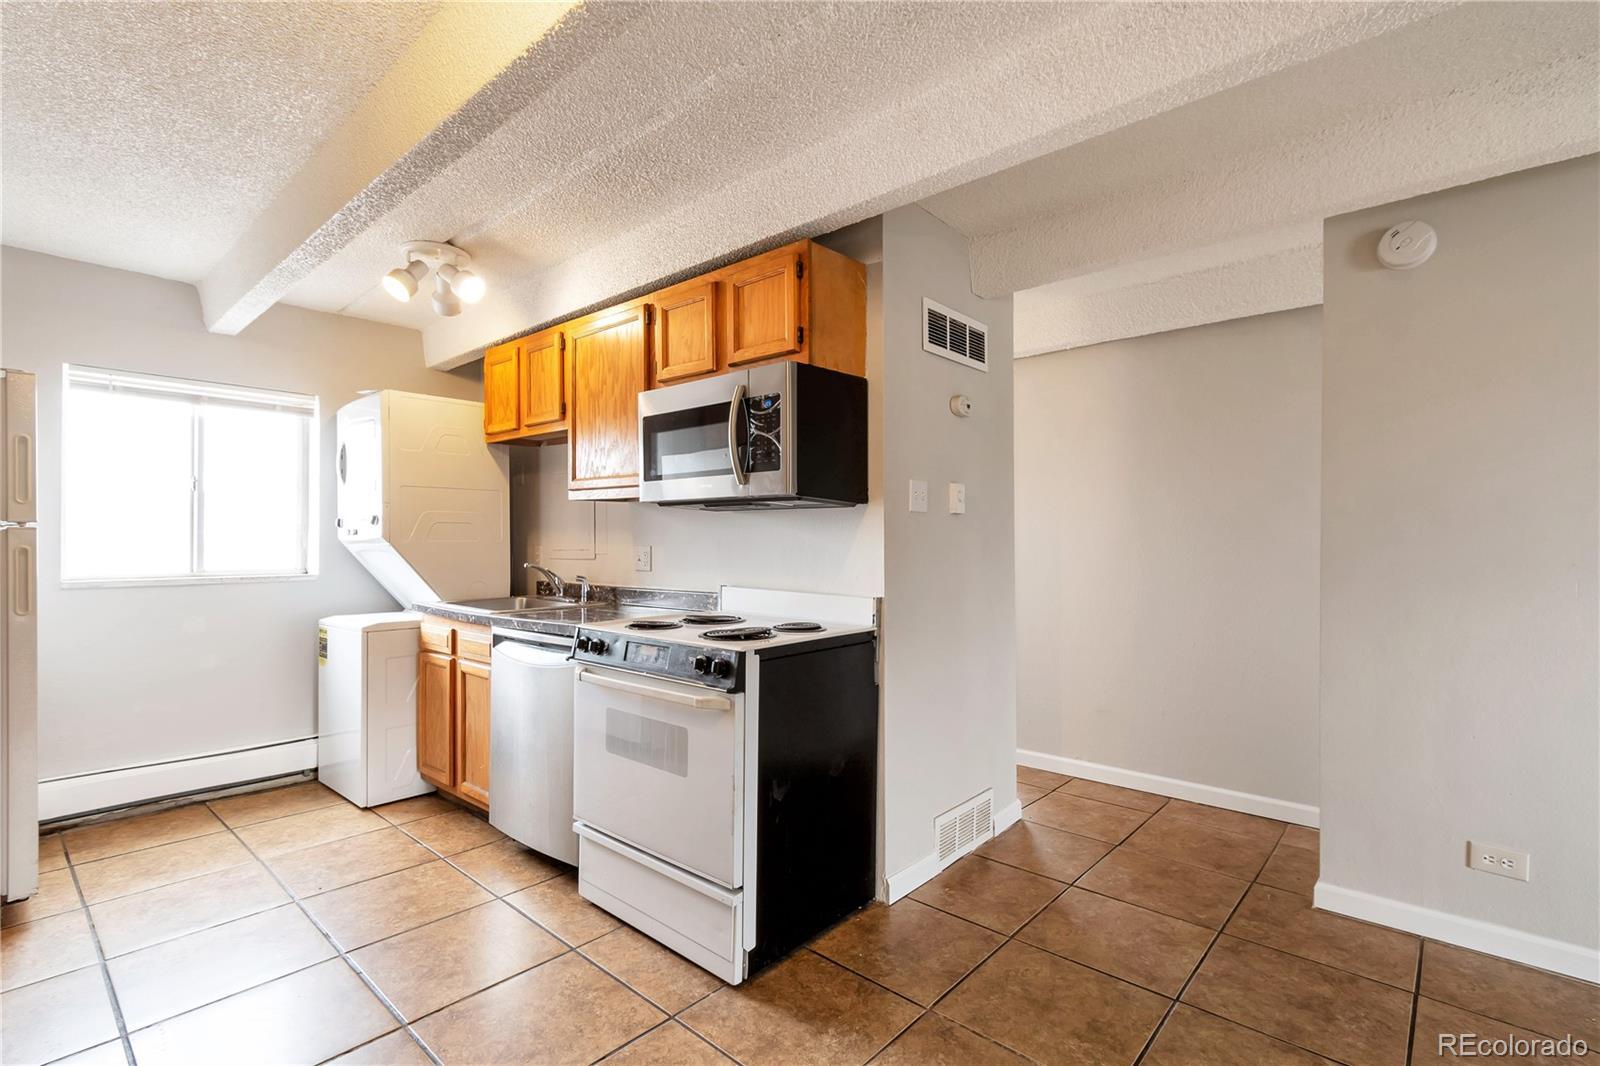 MLS# 5561561 - 2 - 1180 Yosemite Street #202, Denver, CO 80220